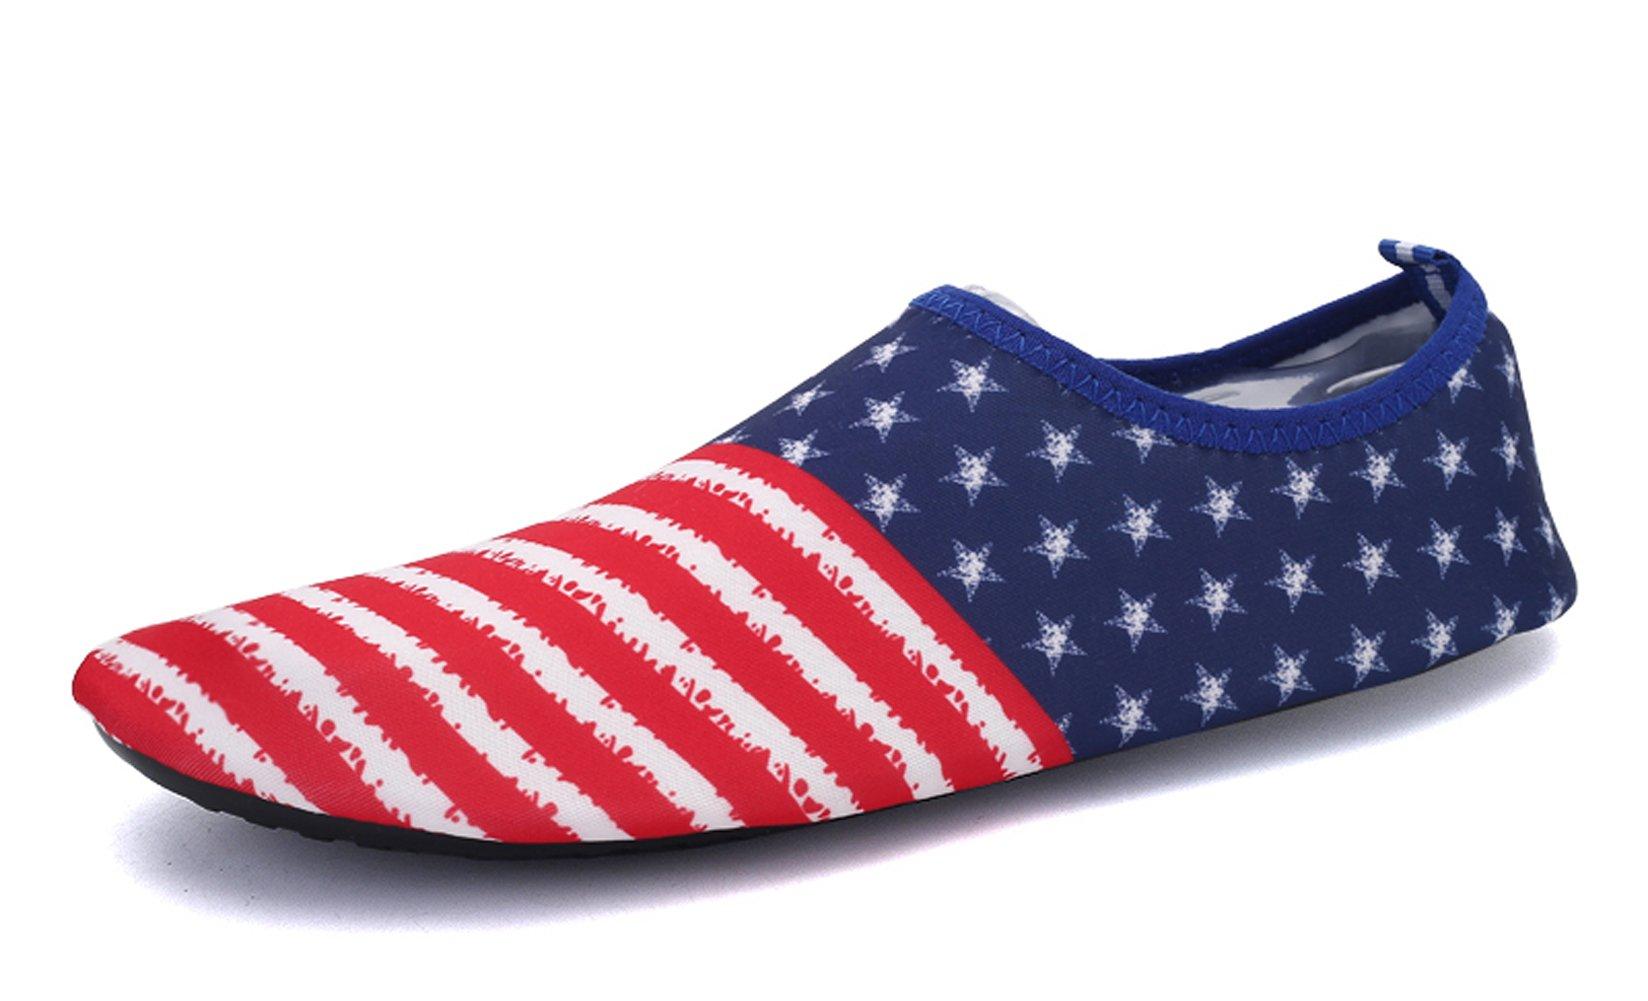 Demetory Unisex Outdoor Water Shoes Neoprene Lightweight Quick-Dry Barefoot Aque Socks Swim, Walking, Yoga, Beach, Water Park by Demetory (Image #4)